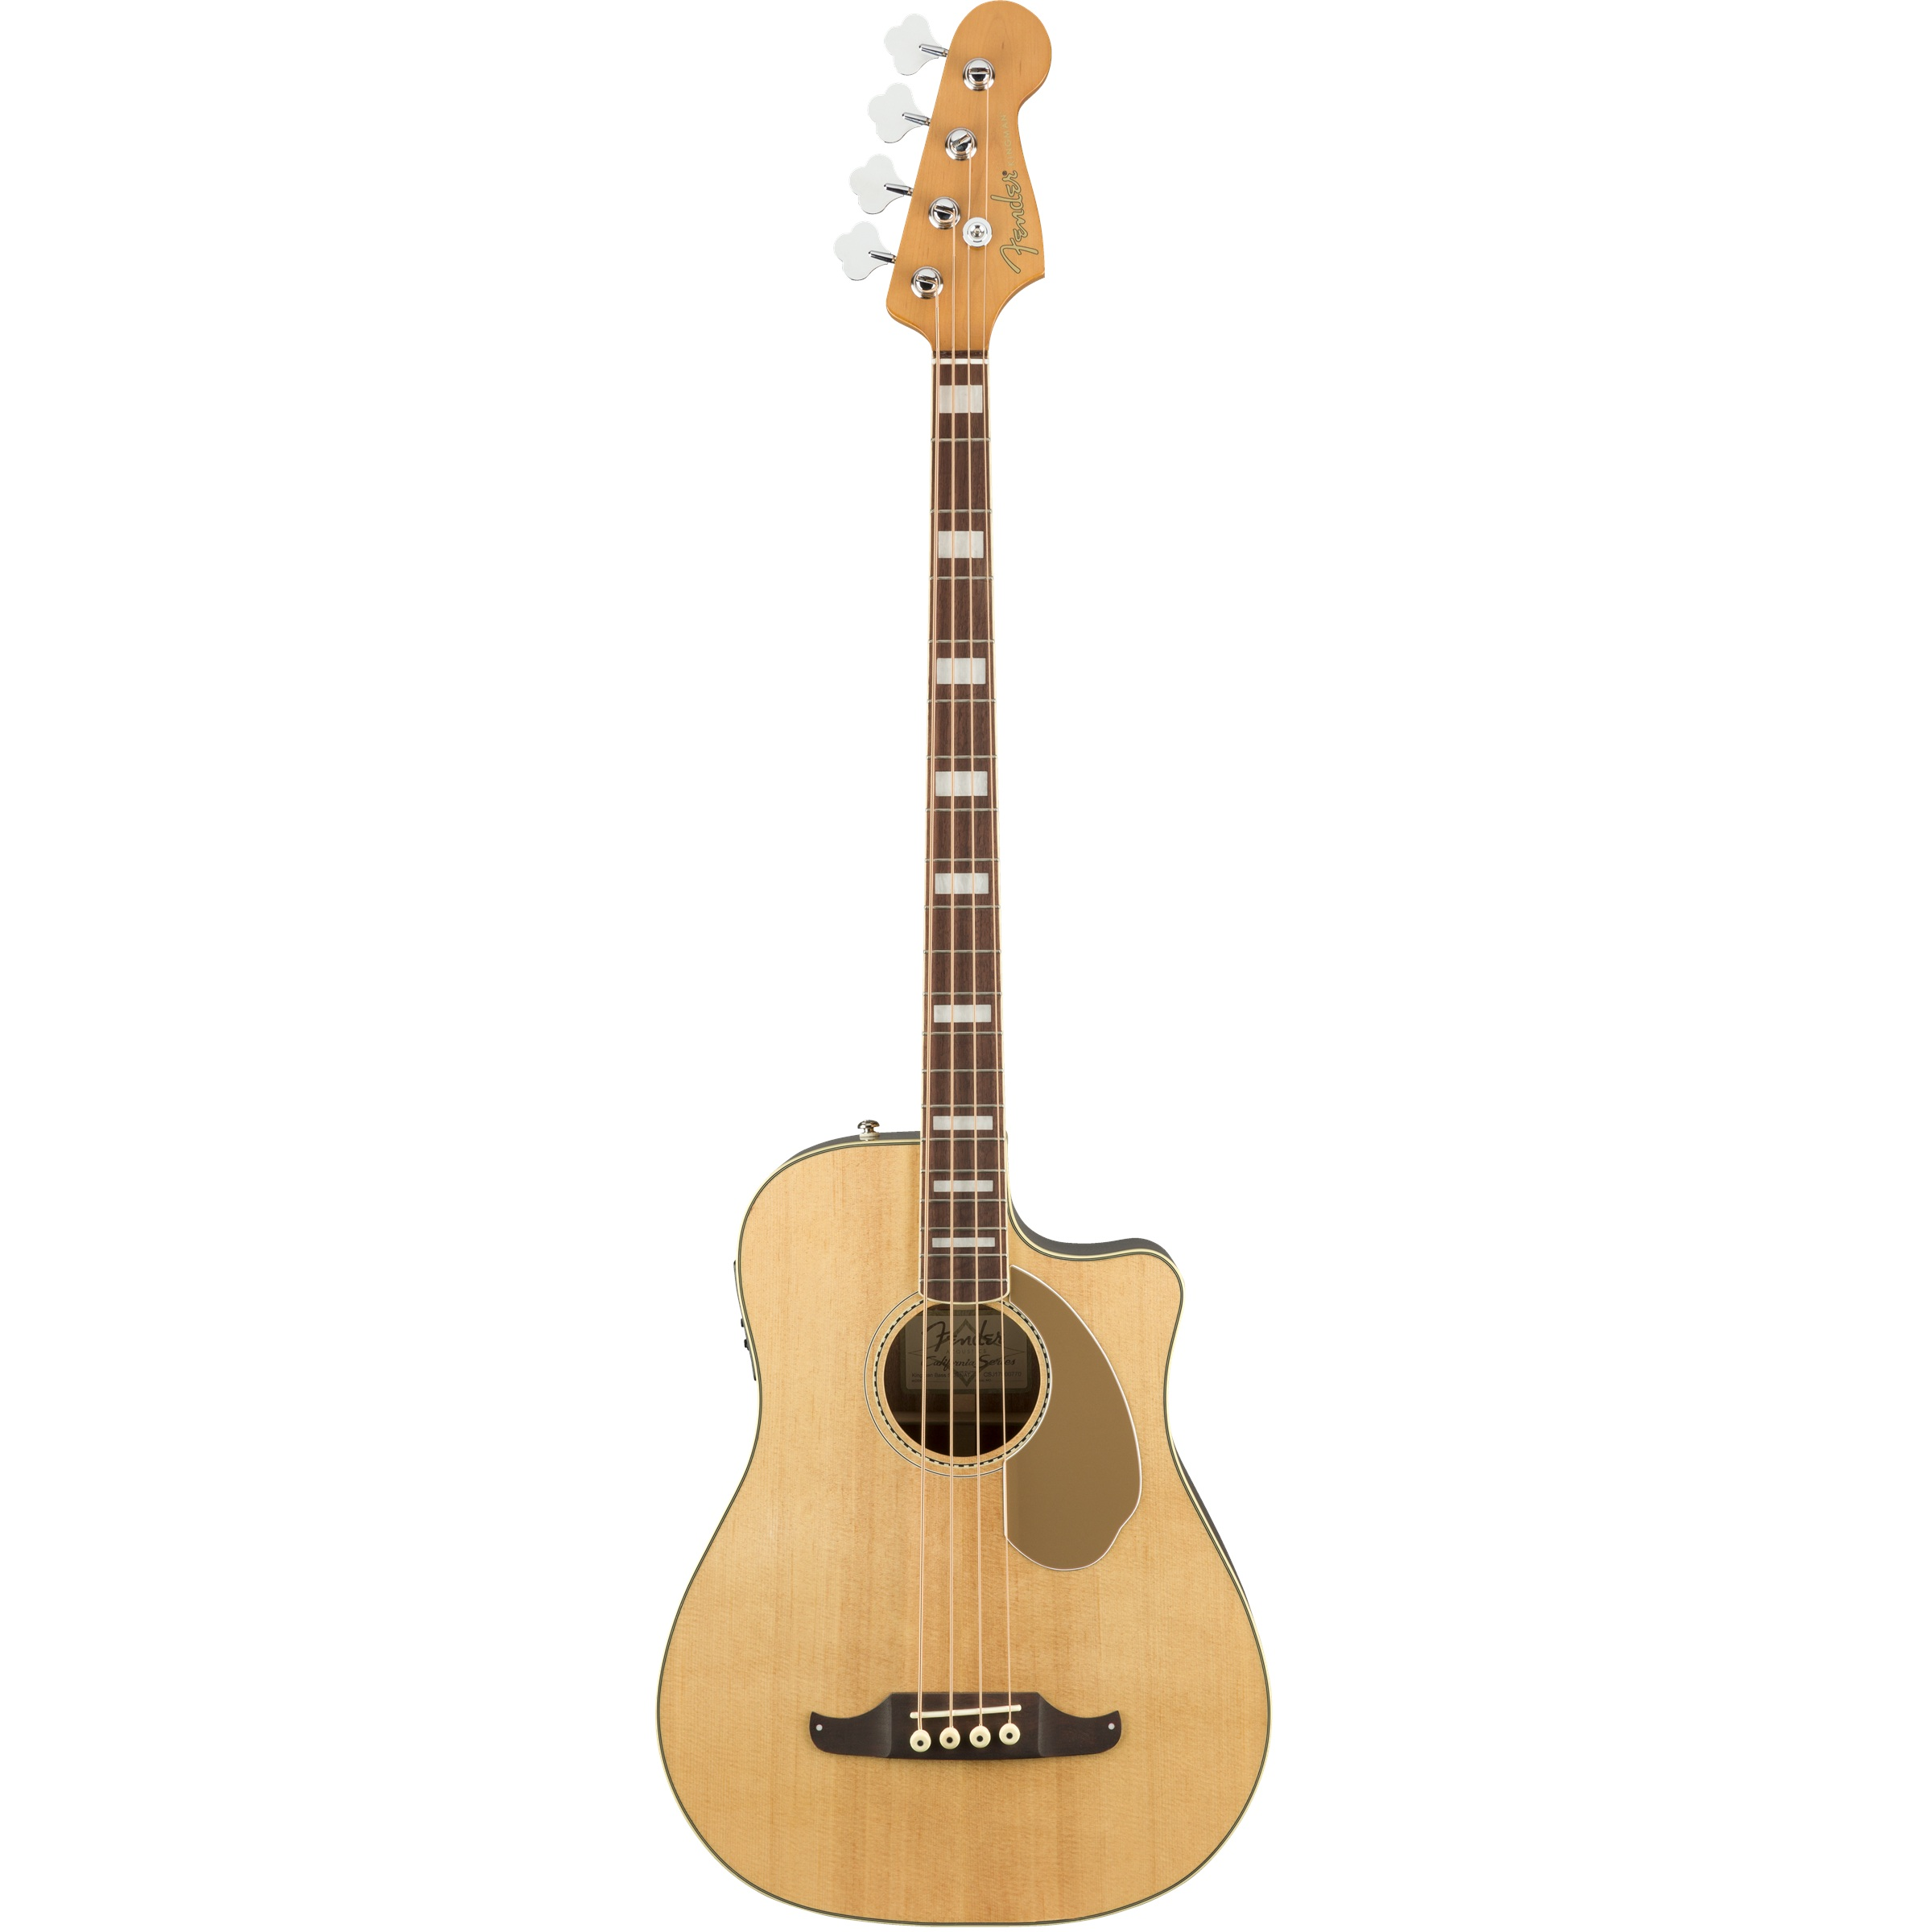 Fender Akustikbass Kingman SCE natural inklusive Koffer